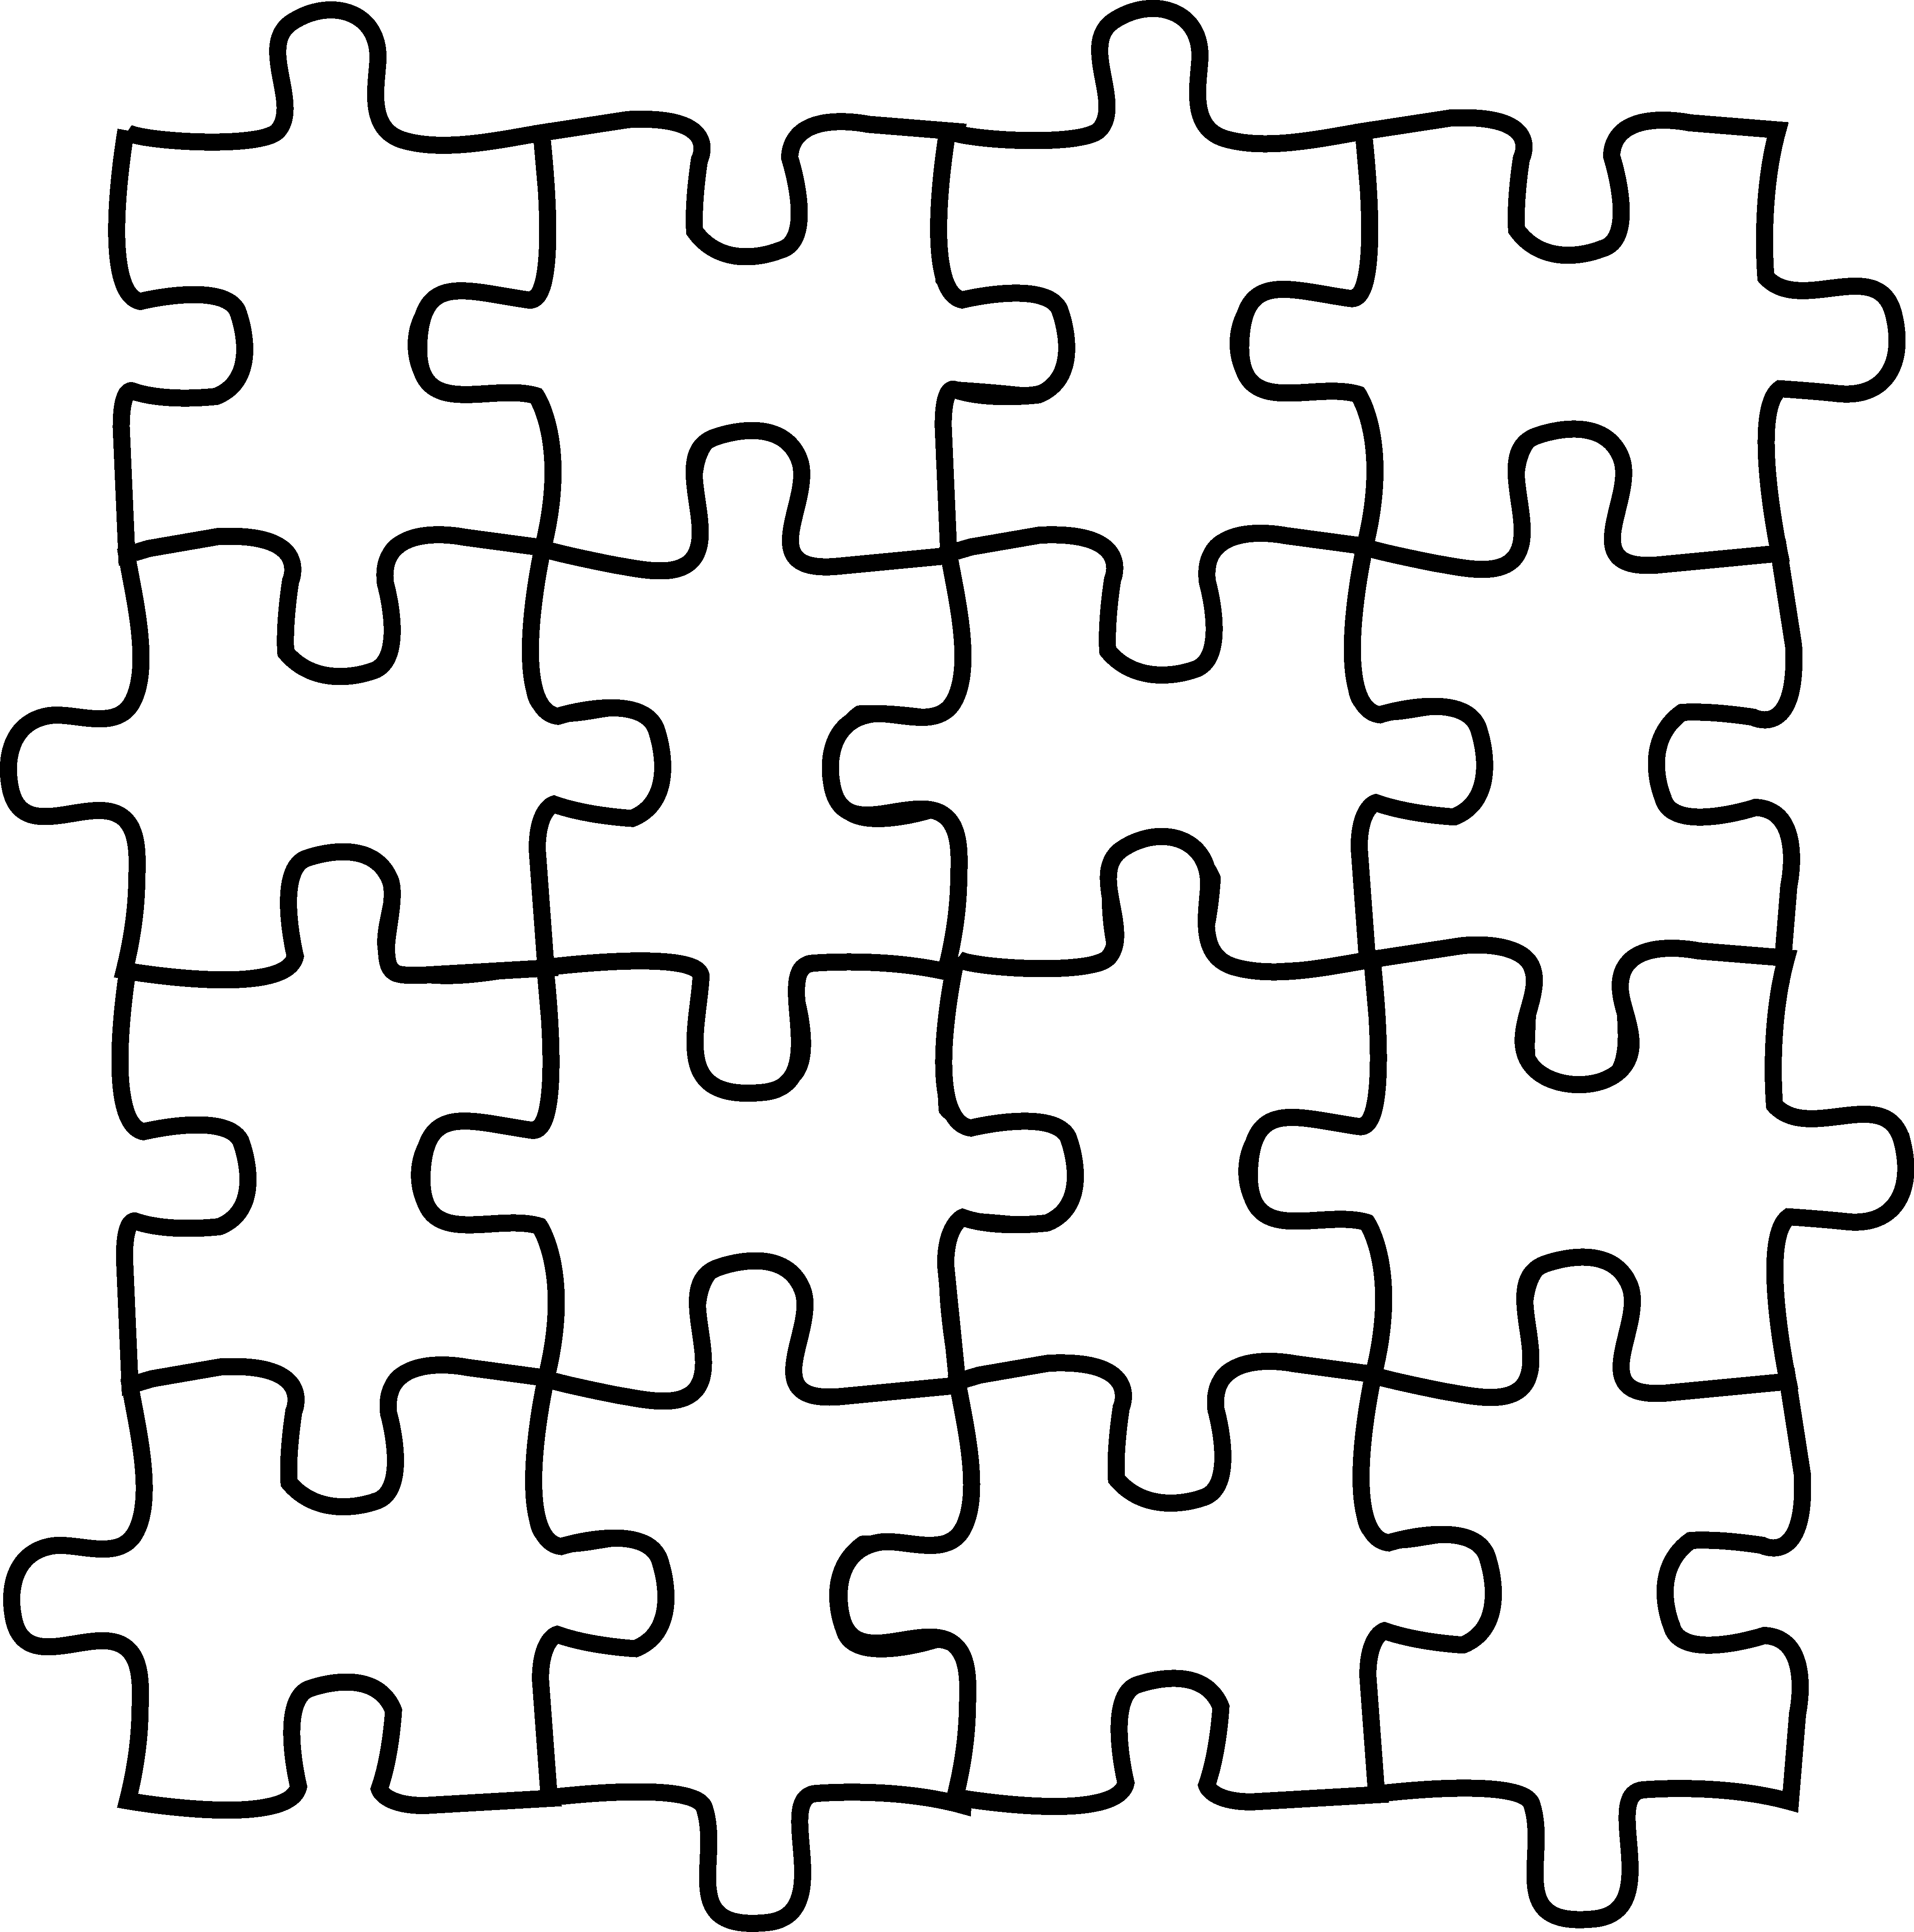 Puzzle pieces coloring page. Square clipart jpeg